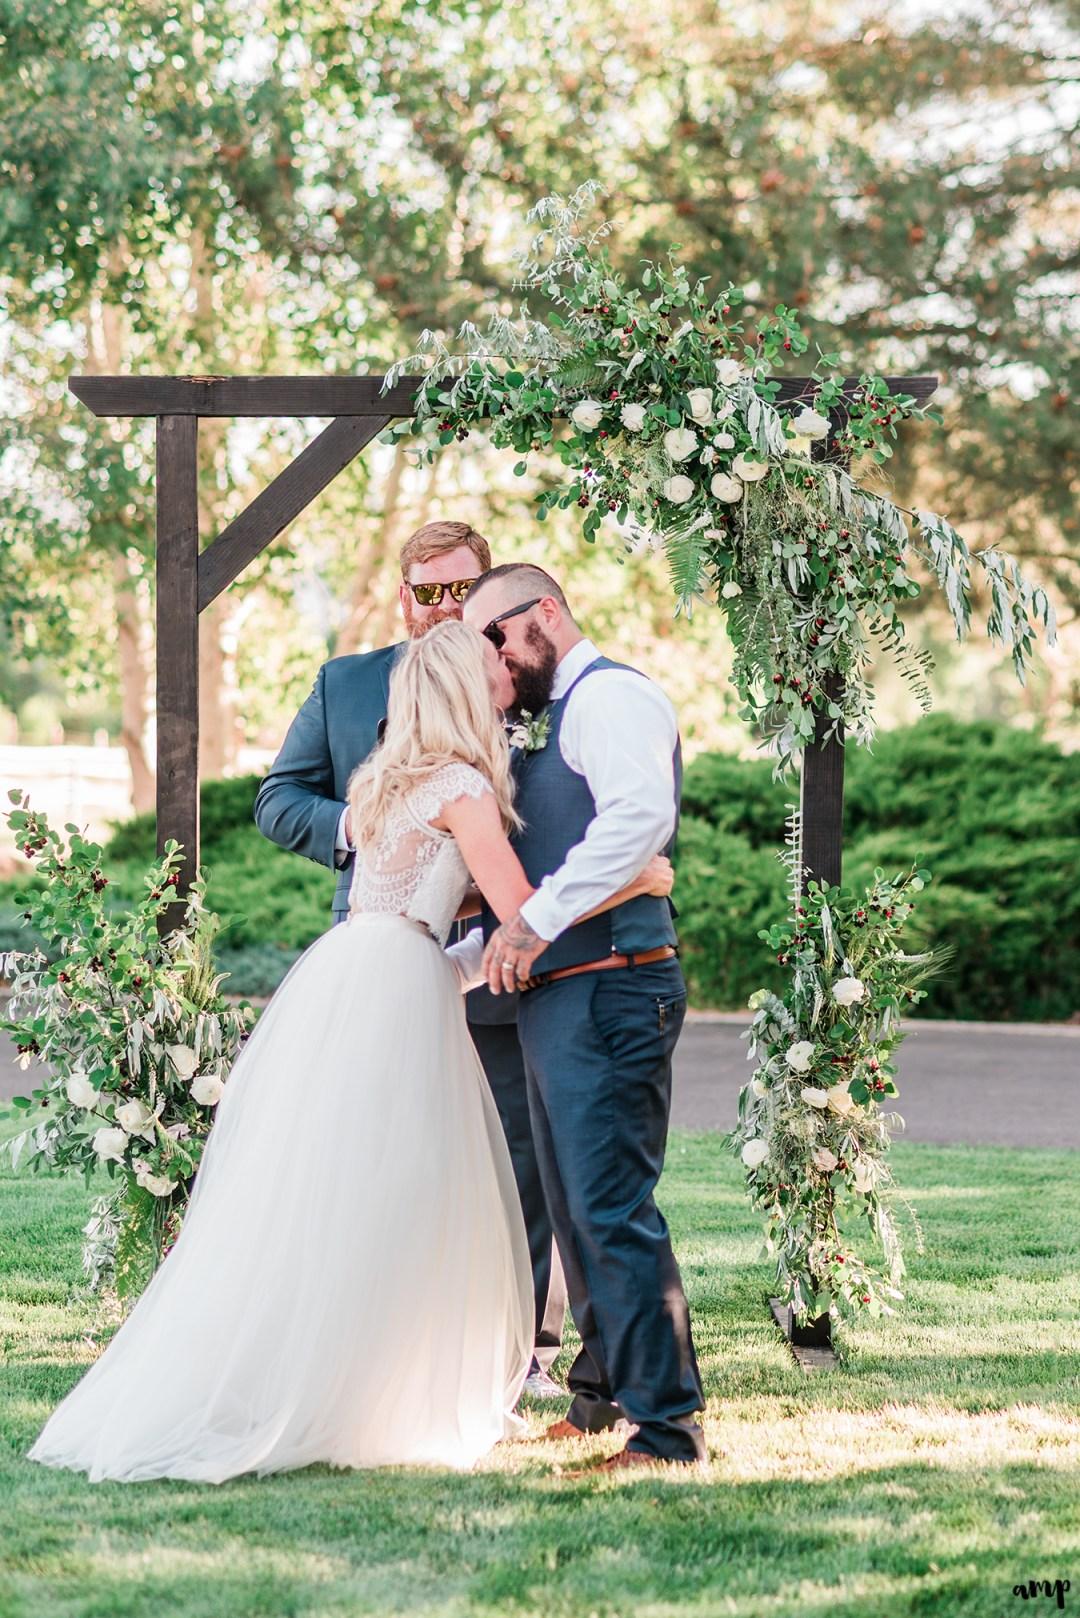 Beth and Dustin's first kiss | Grand Junction Backyard Wedding | amanda.matilda.photography